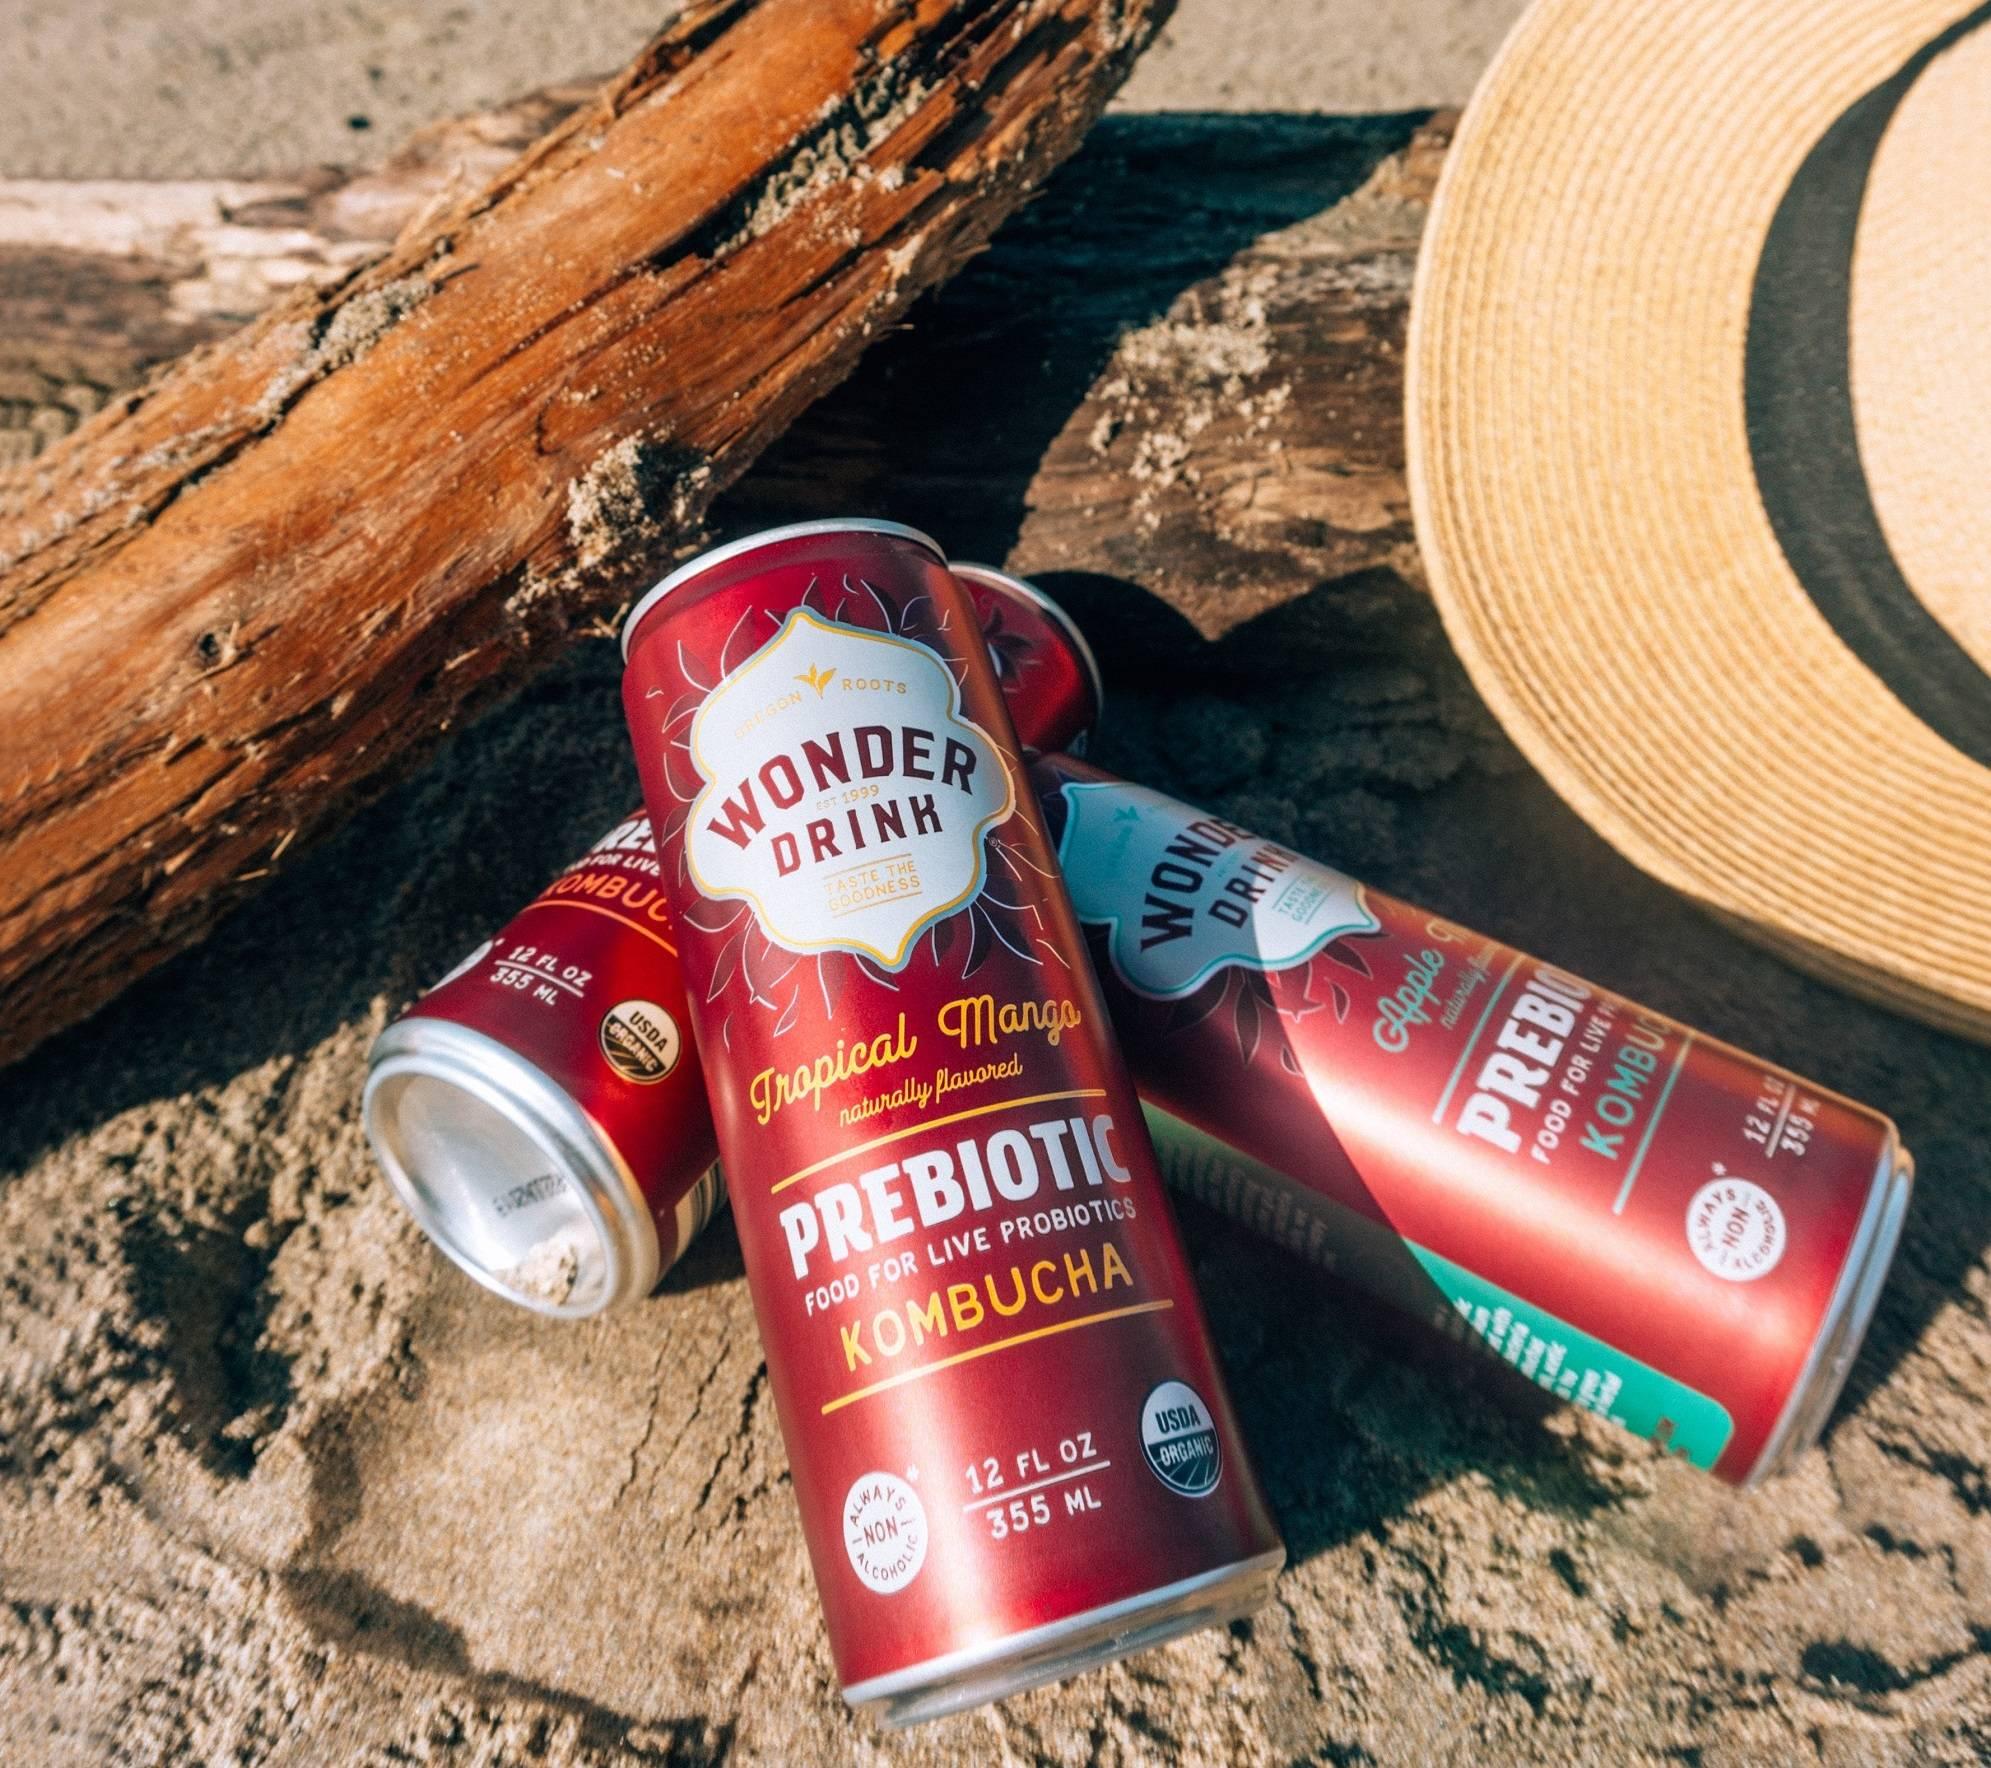 Wonder Drink Prebiotic Kombucha on Beach